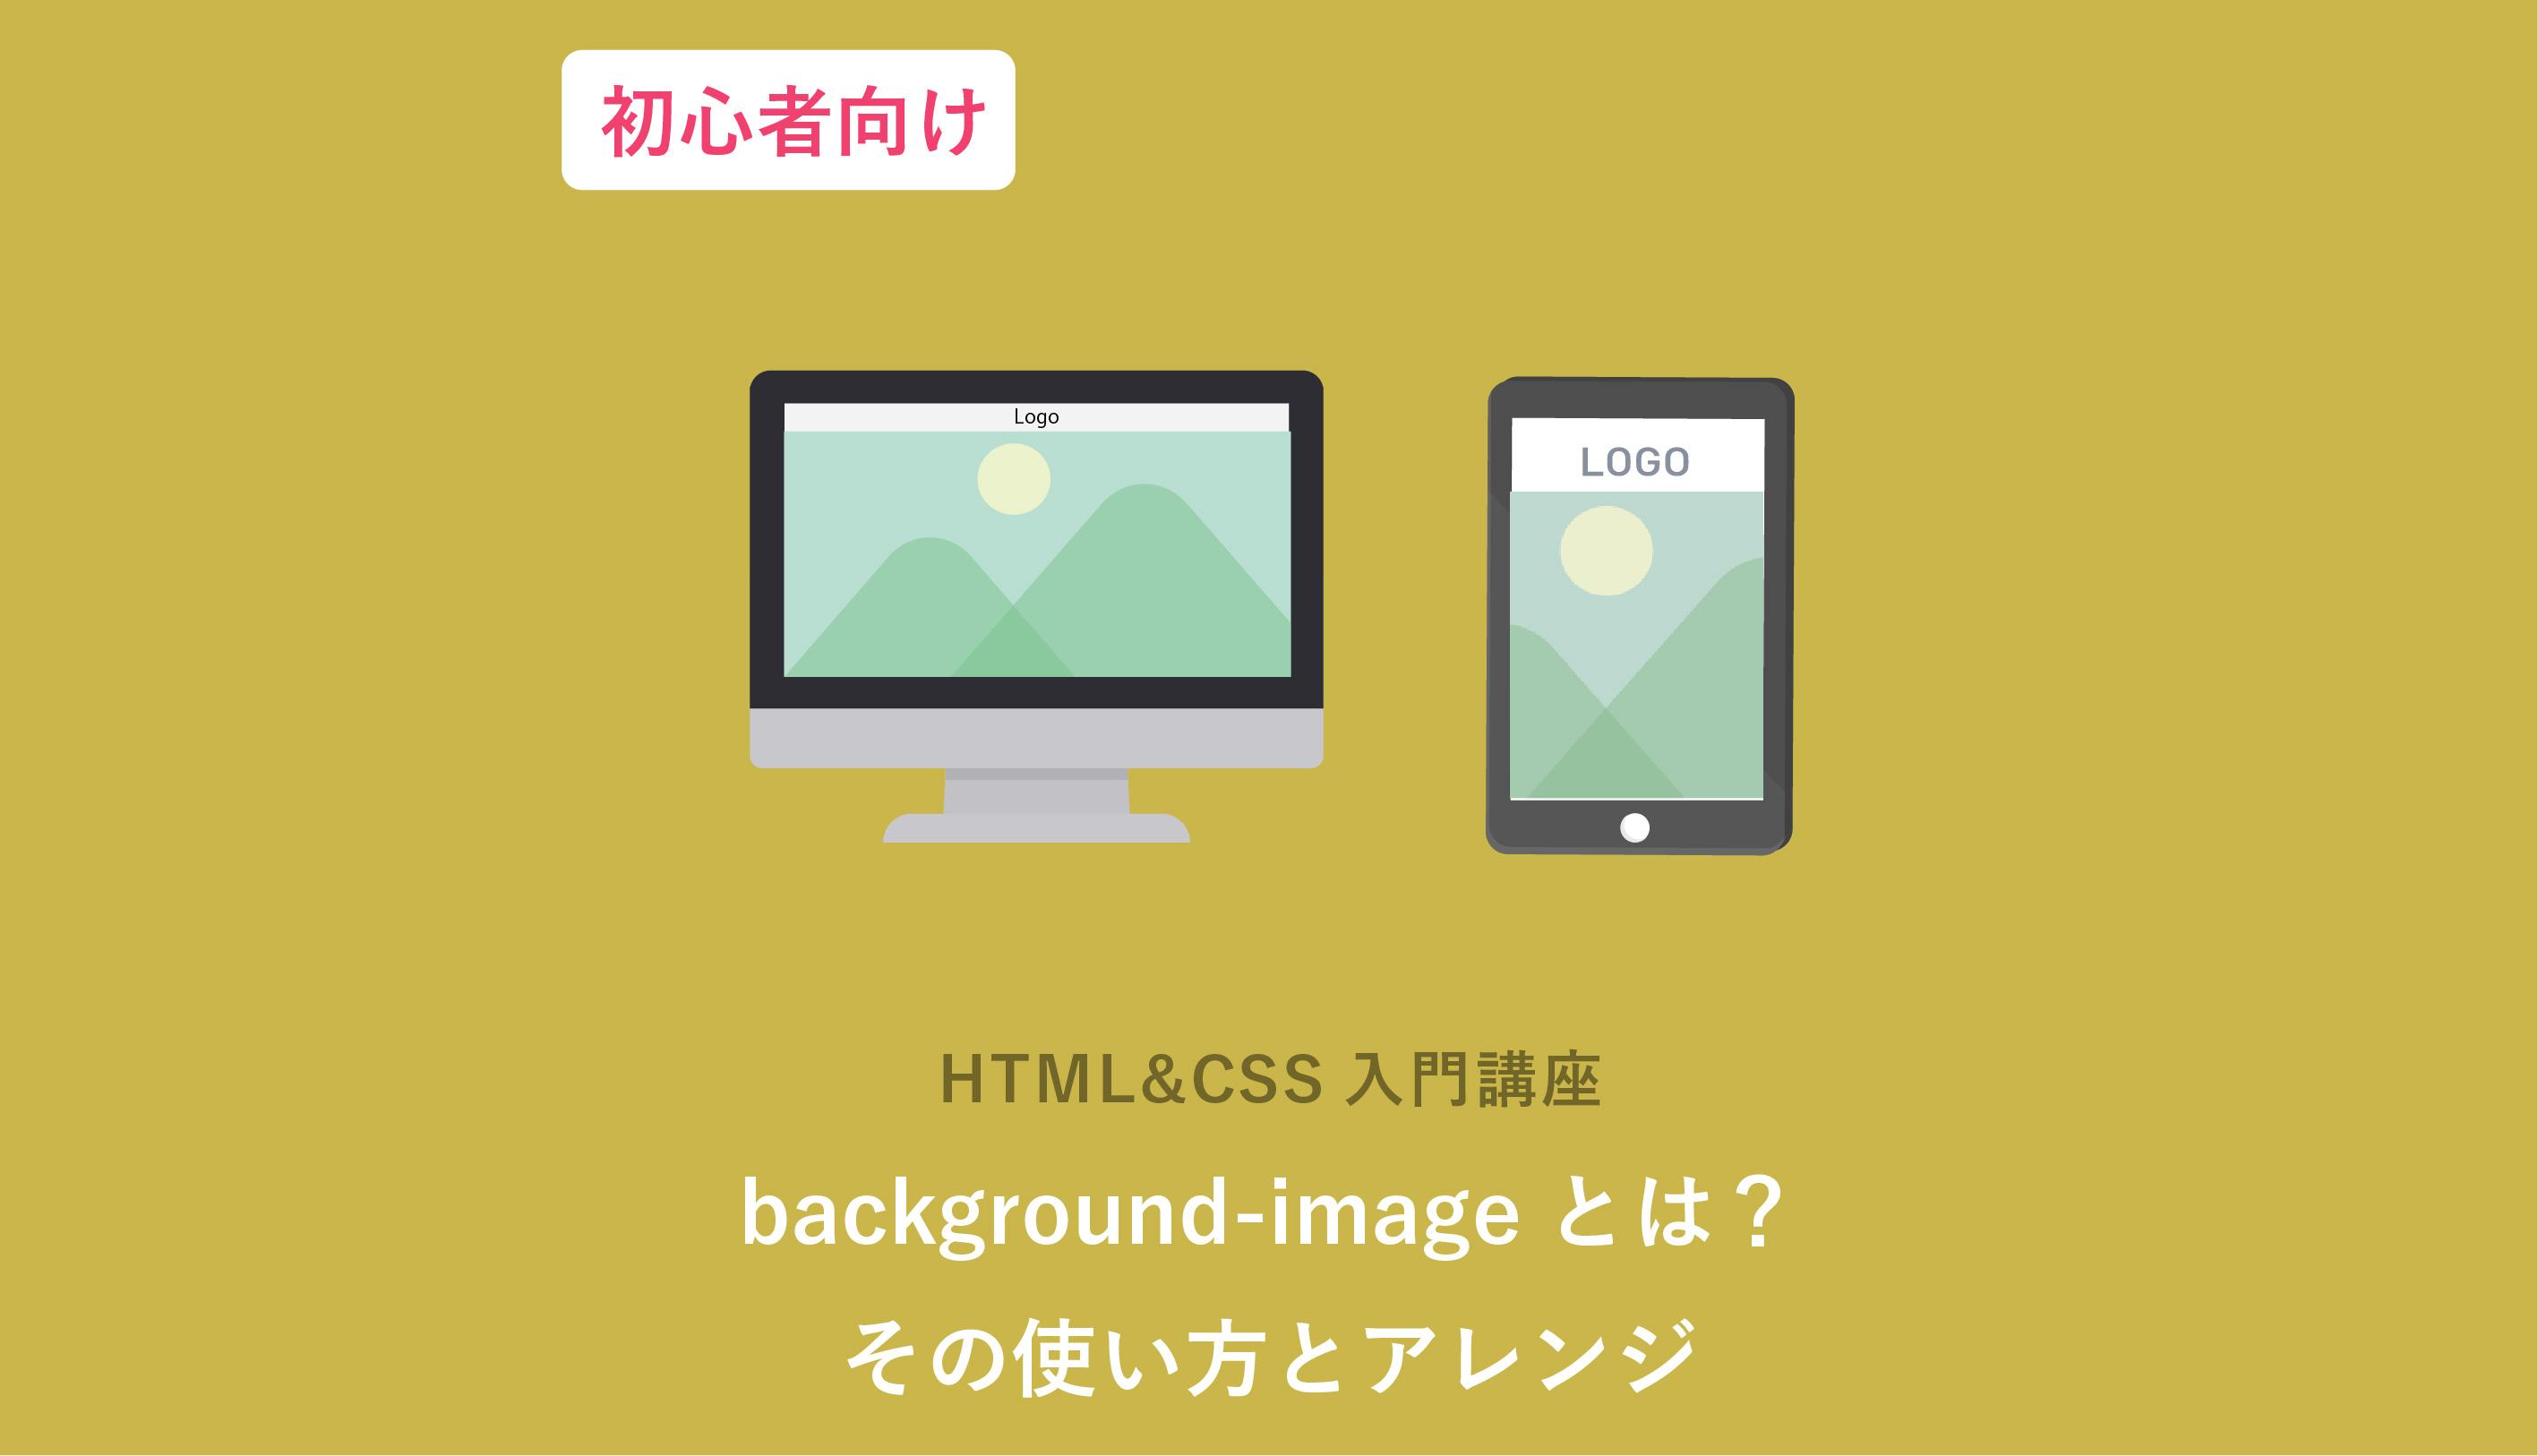 【CSS background-image】背景画像を設定する方法。基本から発展まで徹底解説!